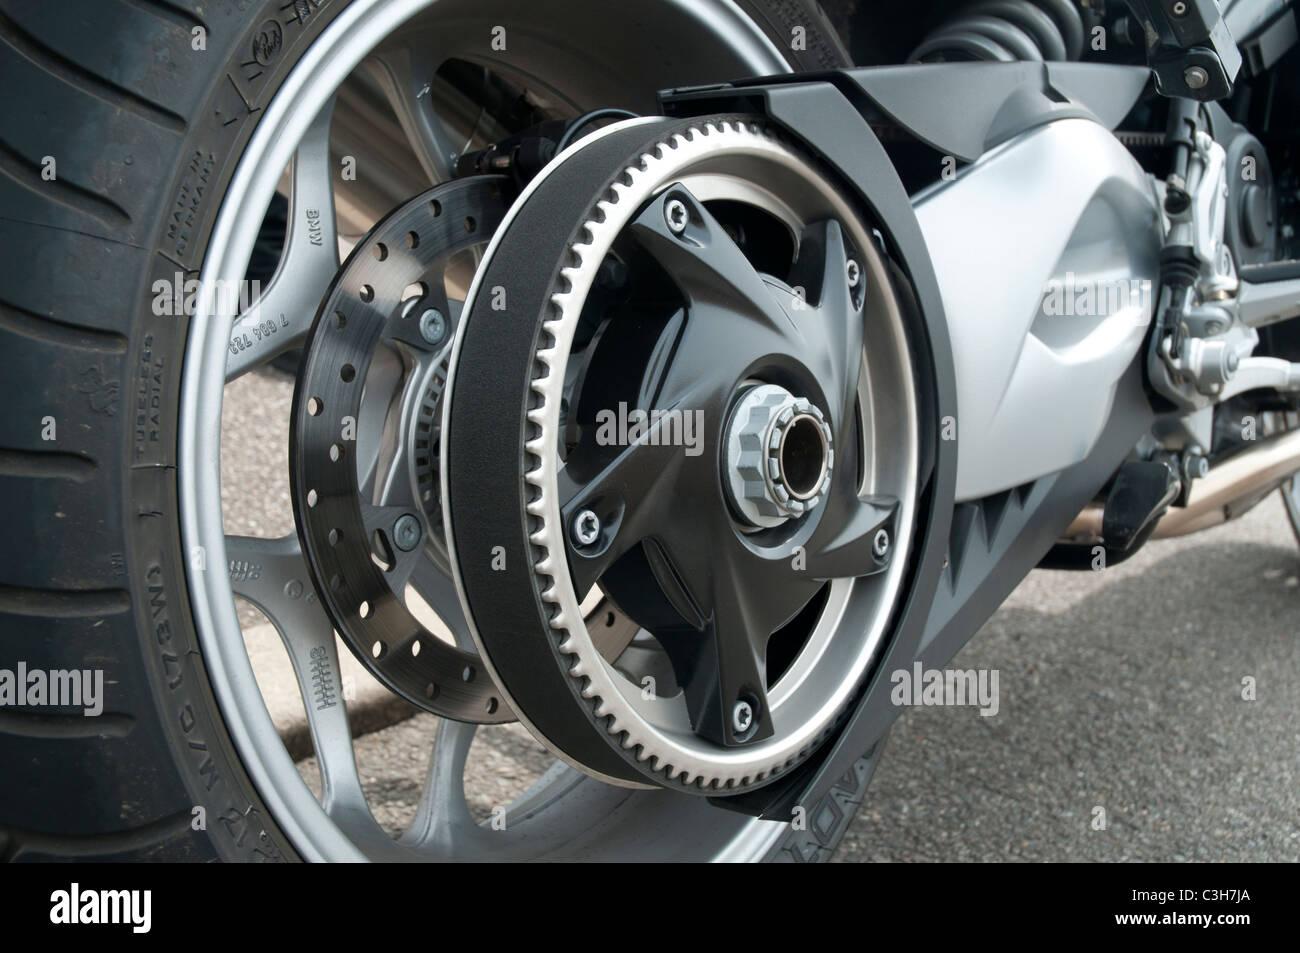 Harley Davidson  Dyna Secondary Chain Kit